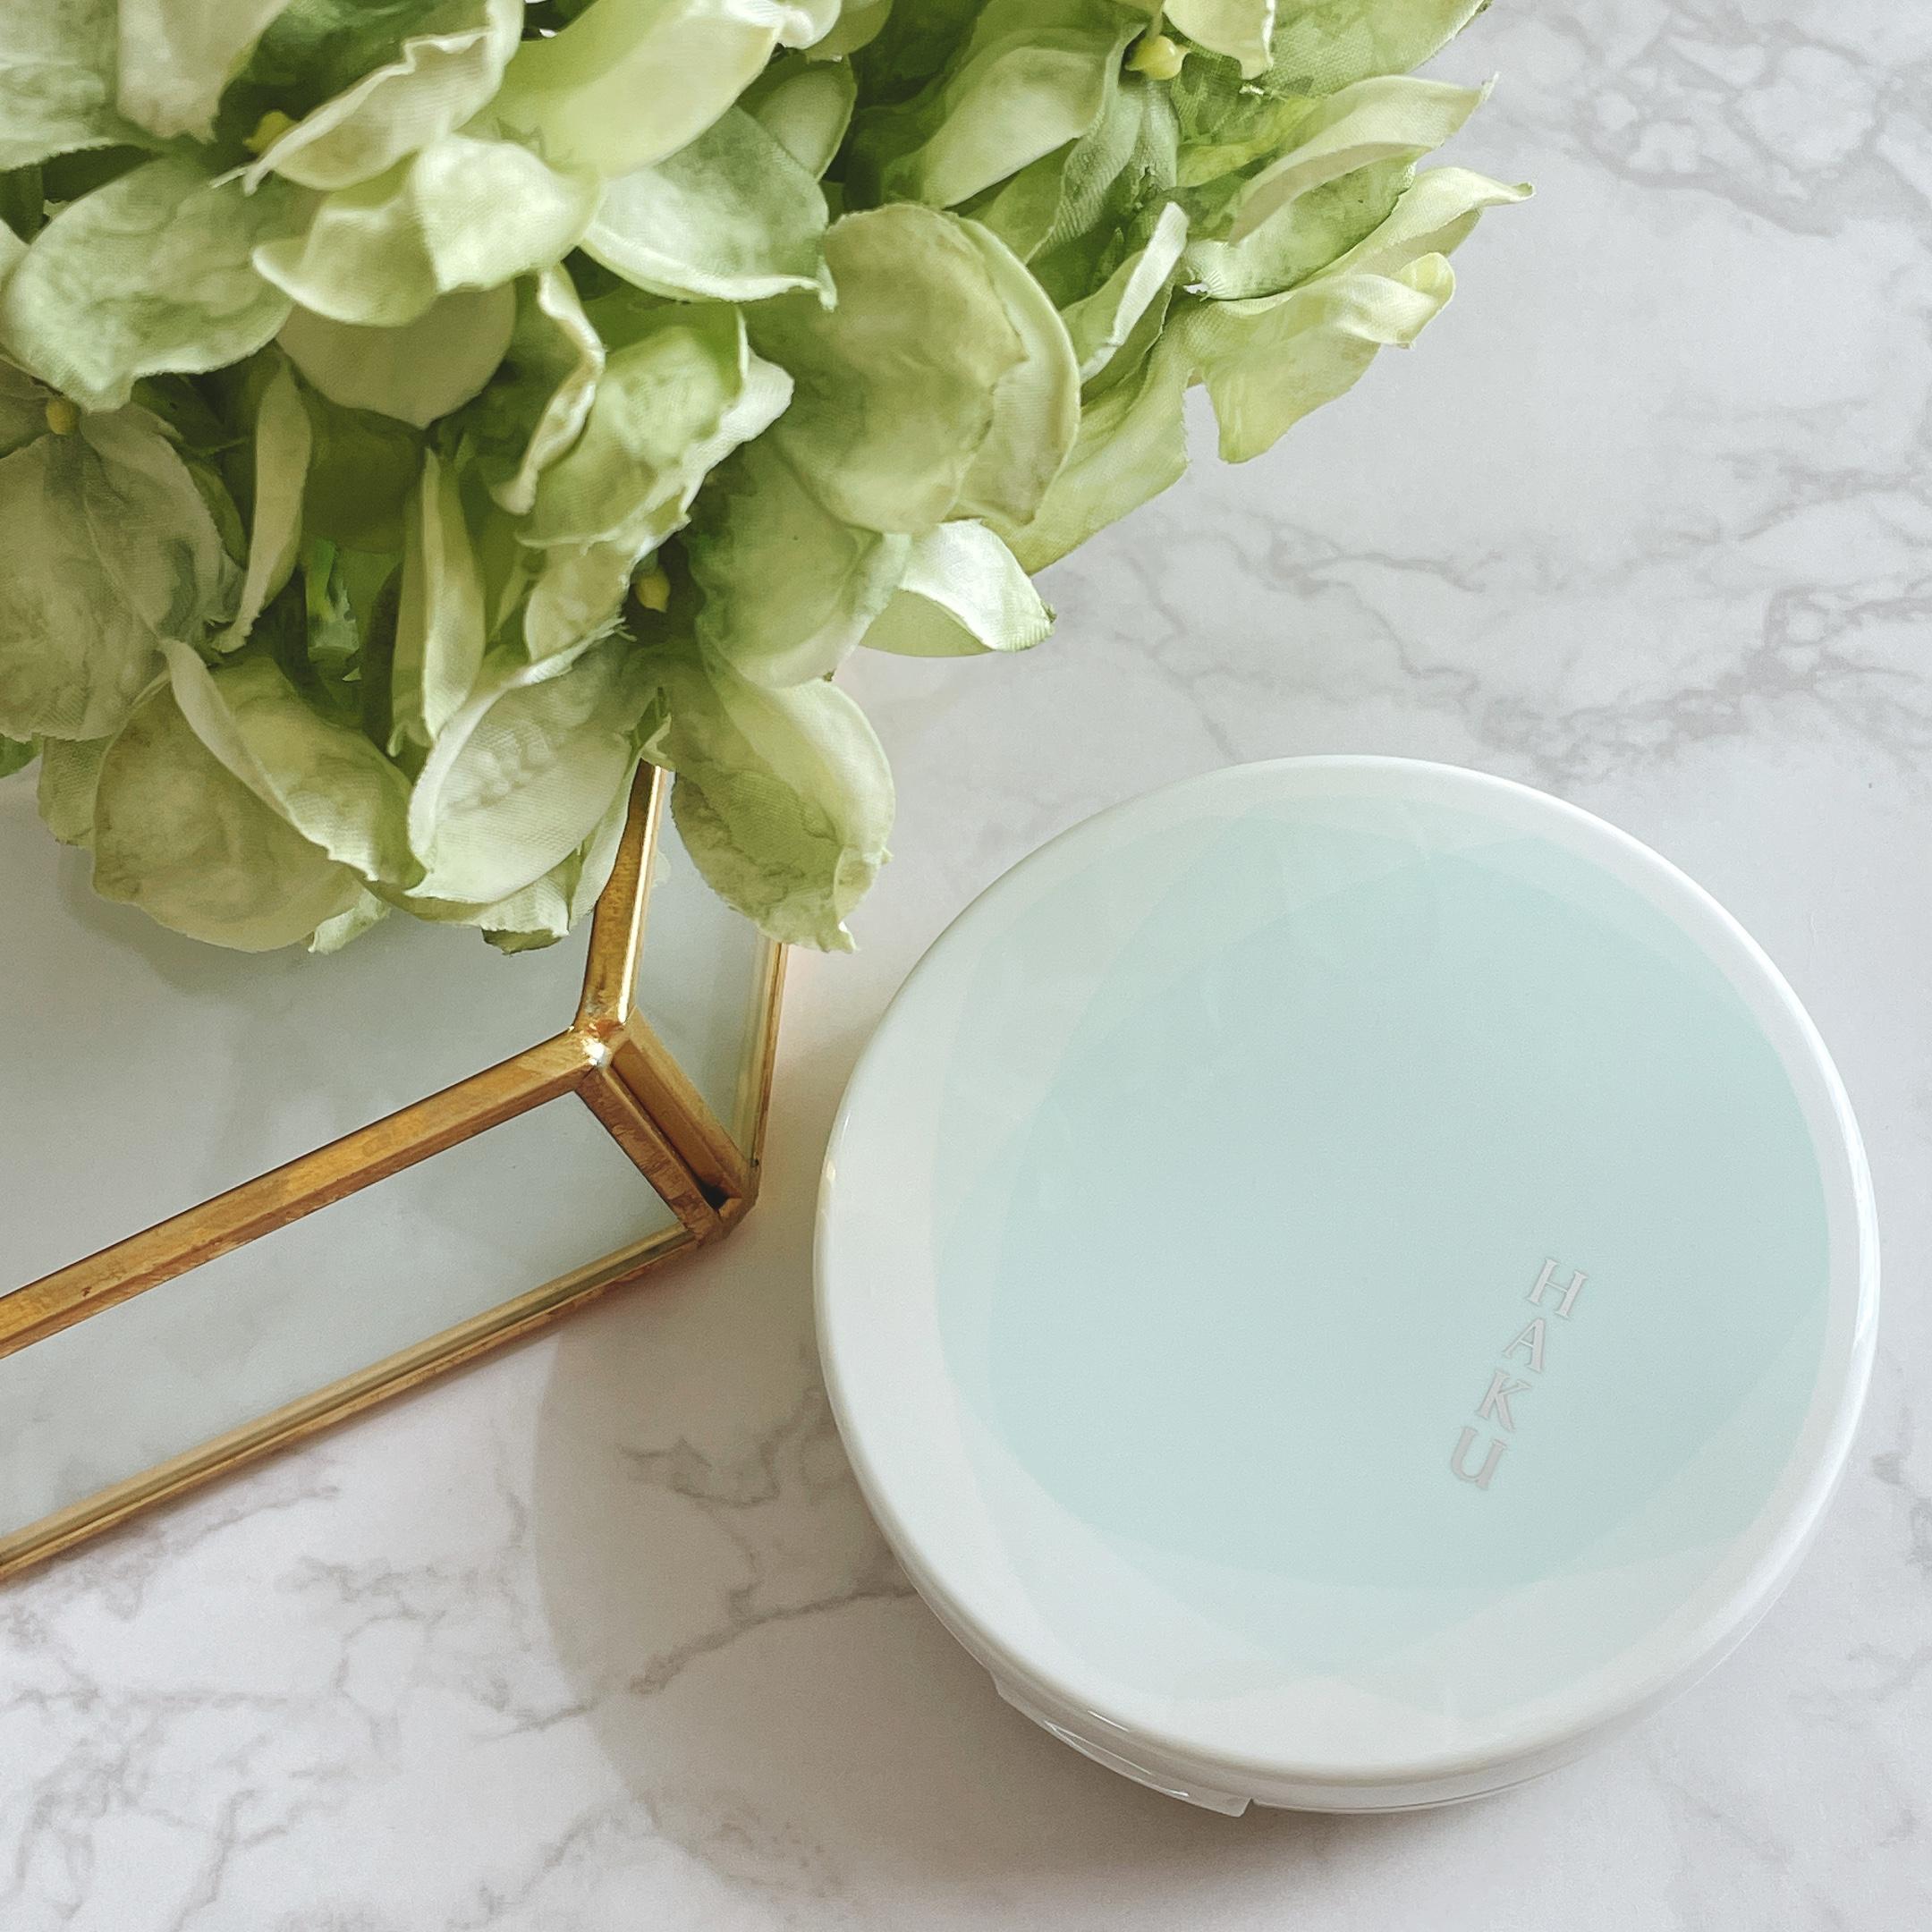 HAKU(ハク) ボタニック サイエンス 薬用 美容液 クッション コンパクトの良い点・メリットに関するoz.designさんの口コミ画像1